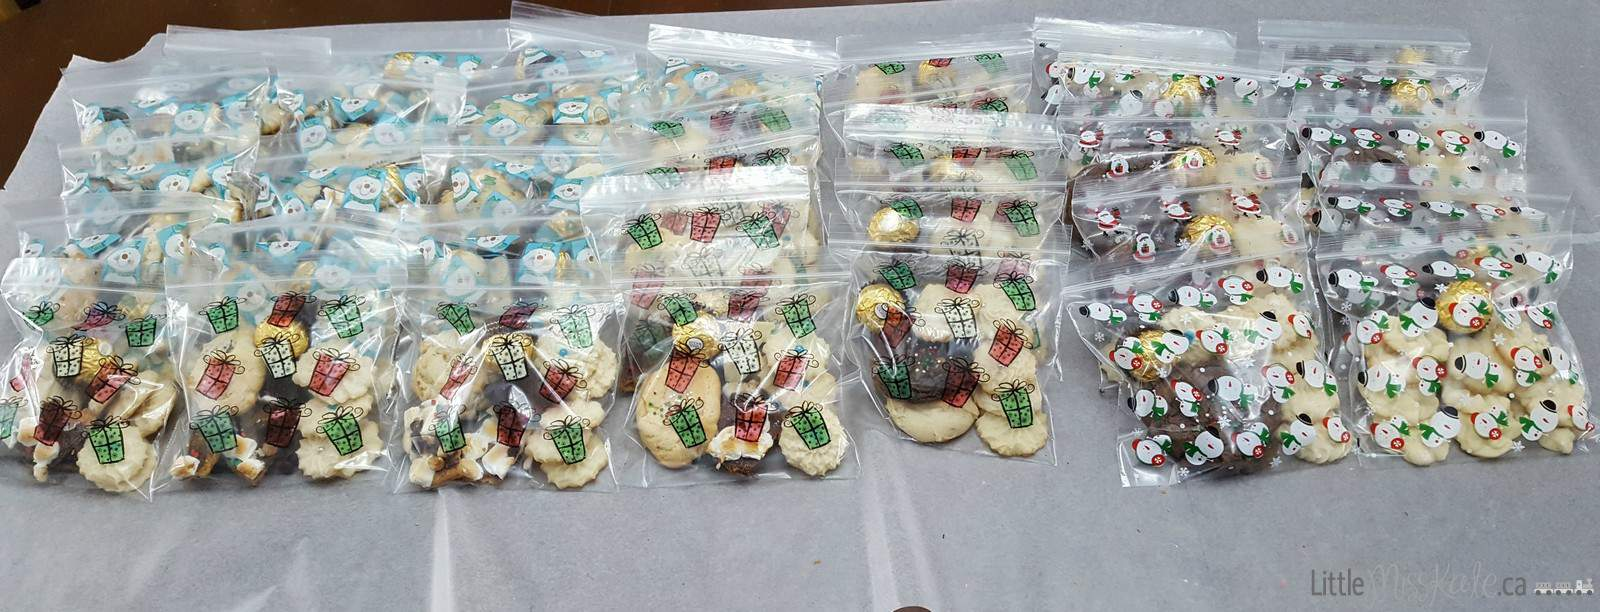 Donate Christmas Baking